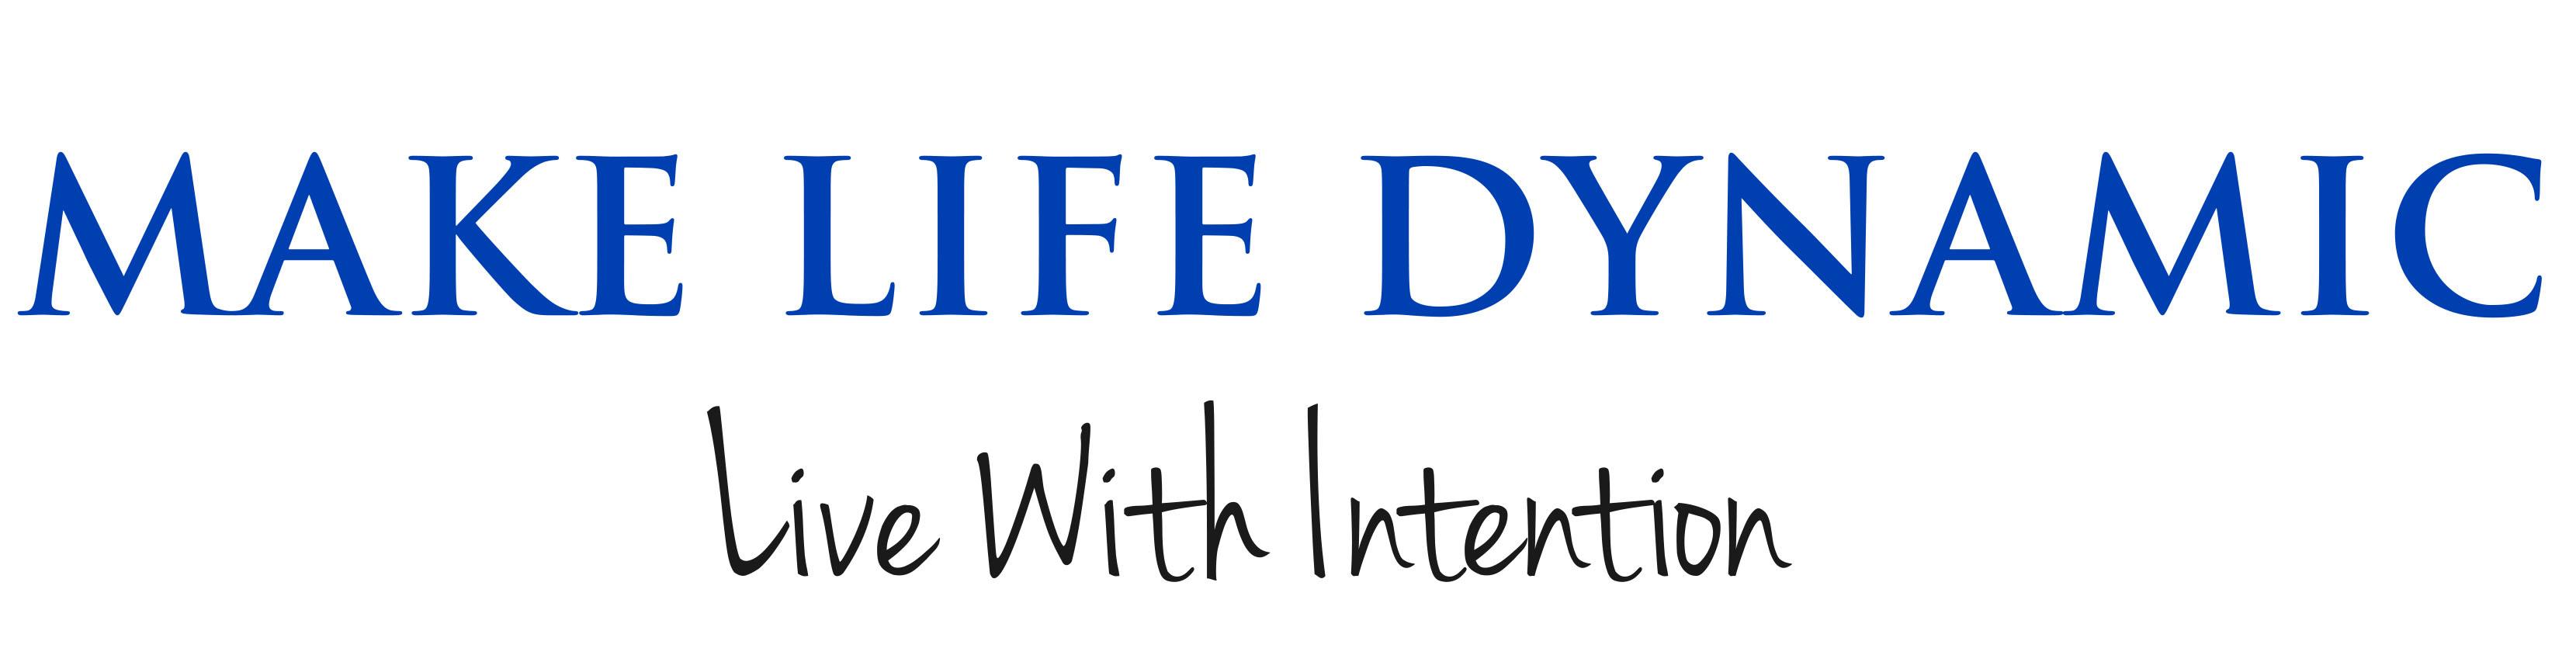 Make Life Dynamic!